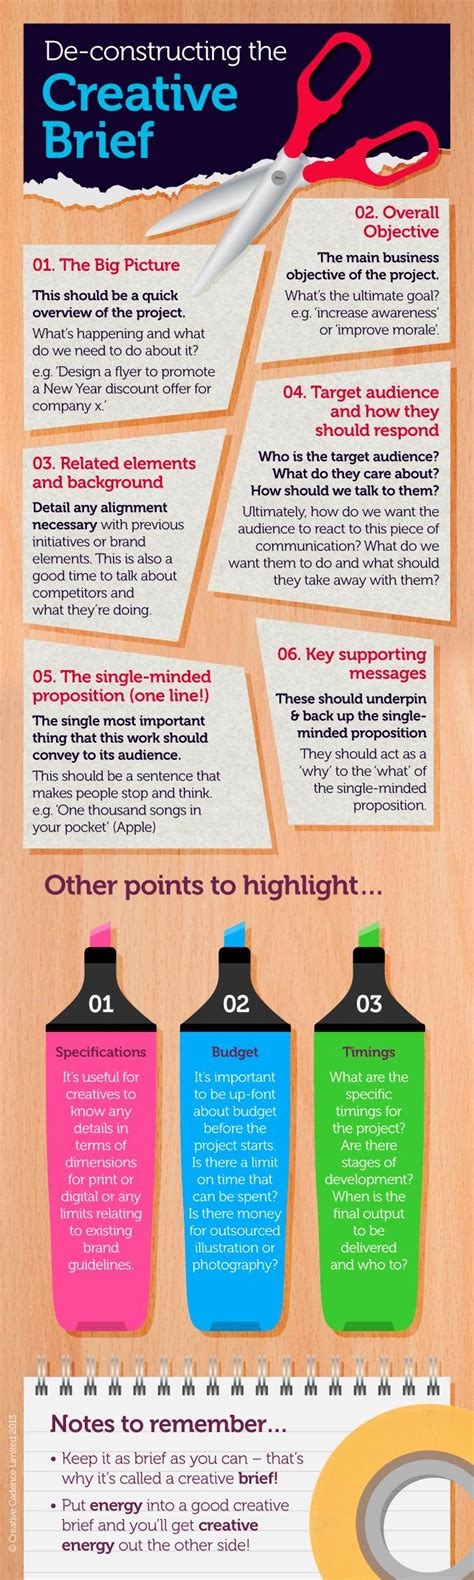 design brief infographic inforgraphic representation of a creative brief web